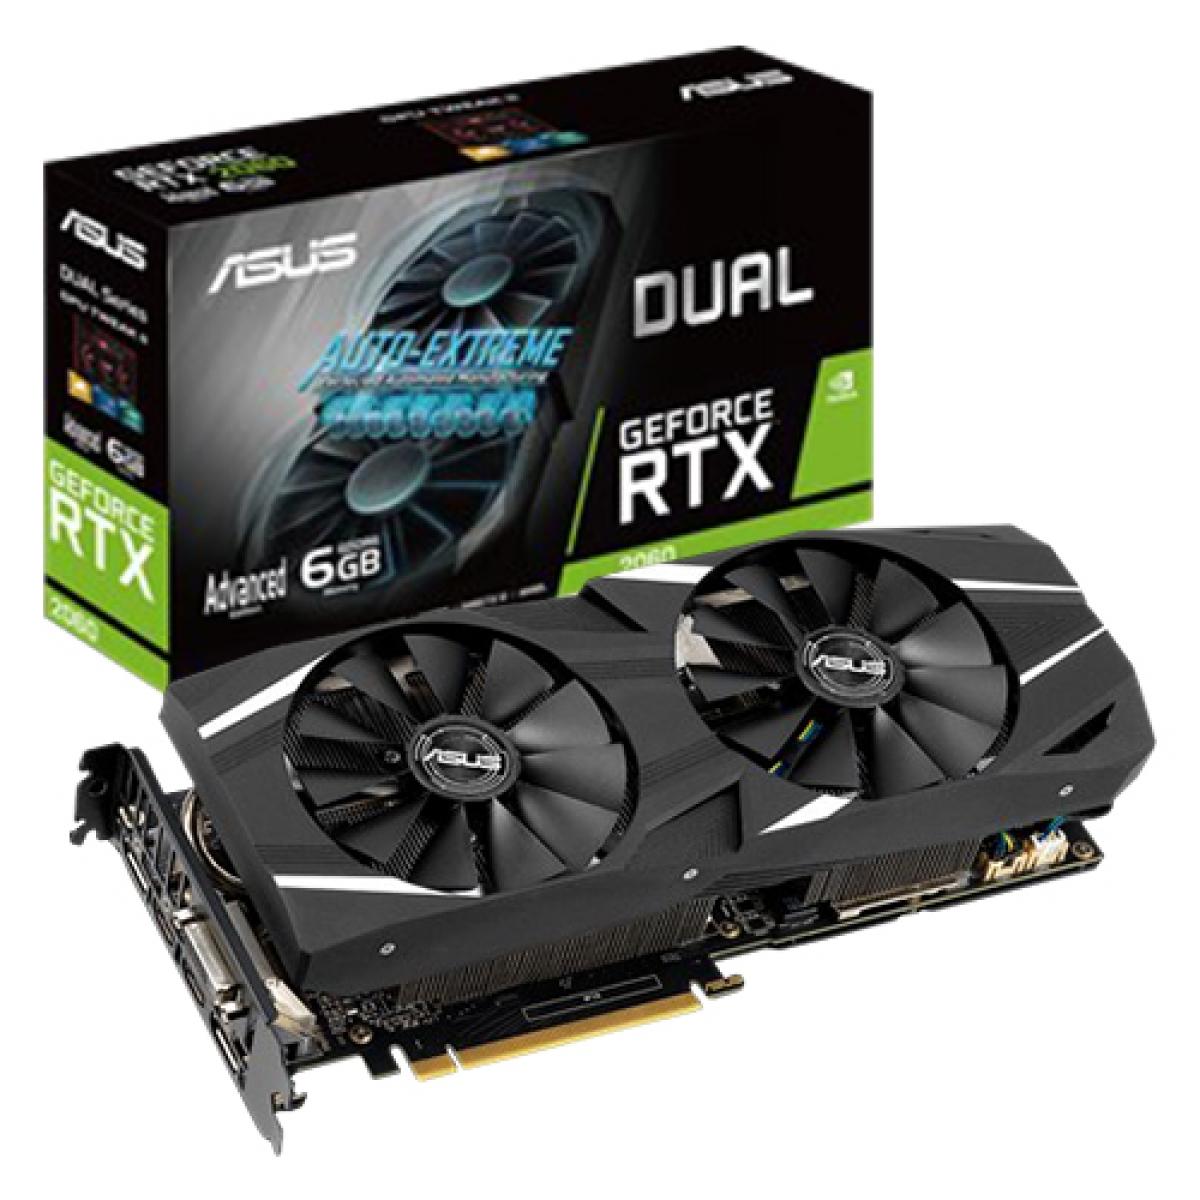 Placa de Vídeo Asus, Geforce, RTX 2060 Dual Advanced edition, 6GB, GDDR6, 192Bit, DUAL-RTX2060-A6G